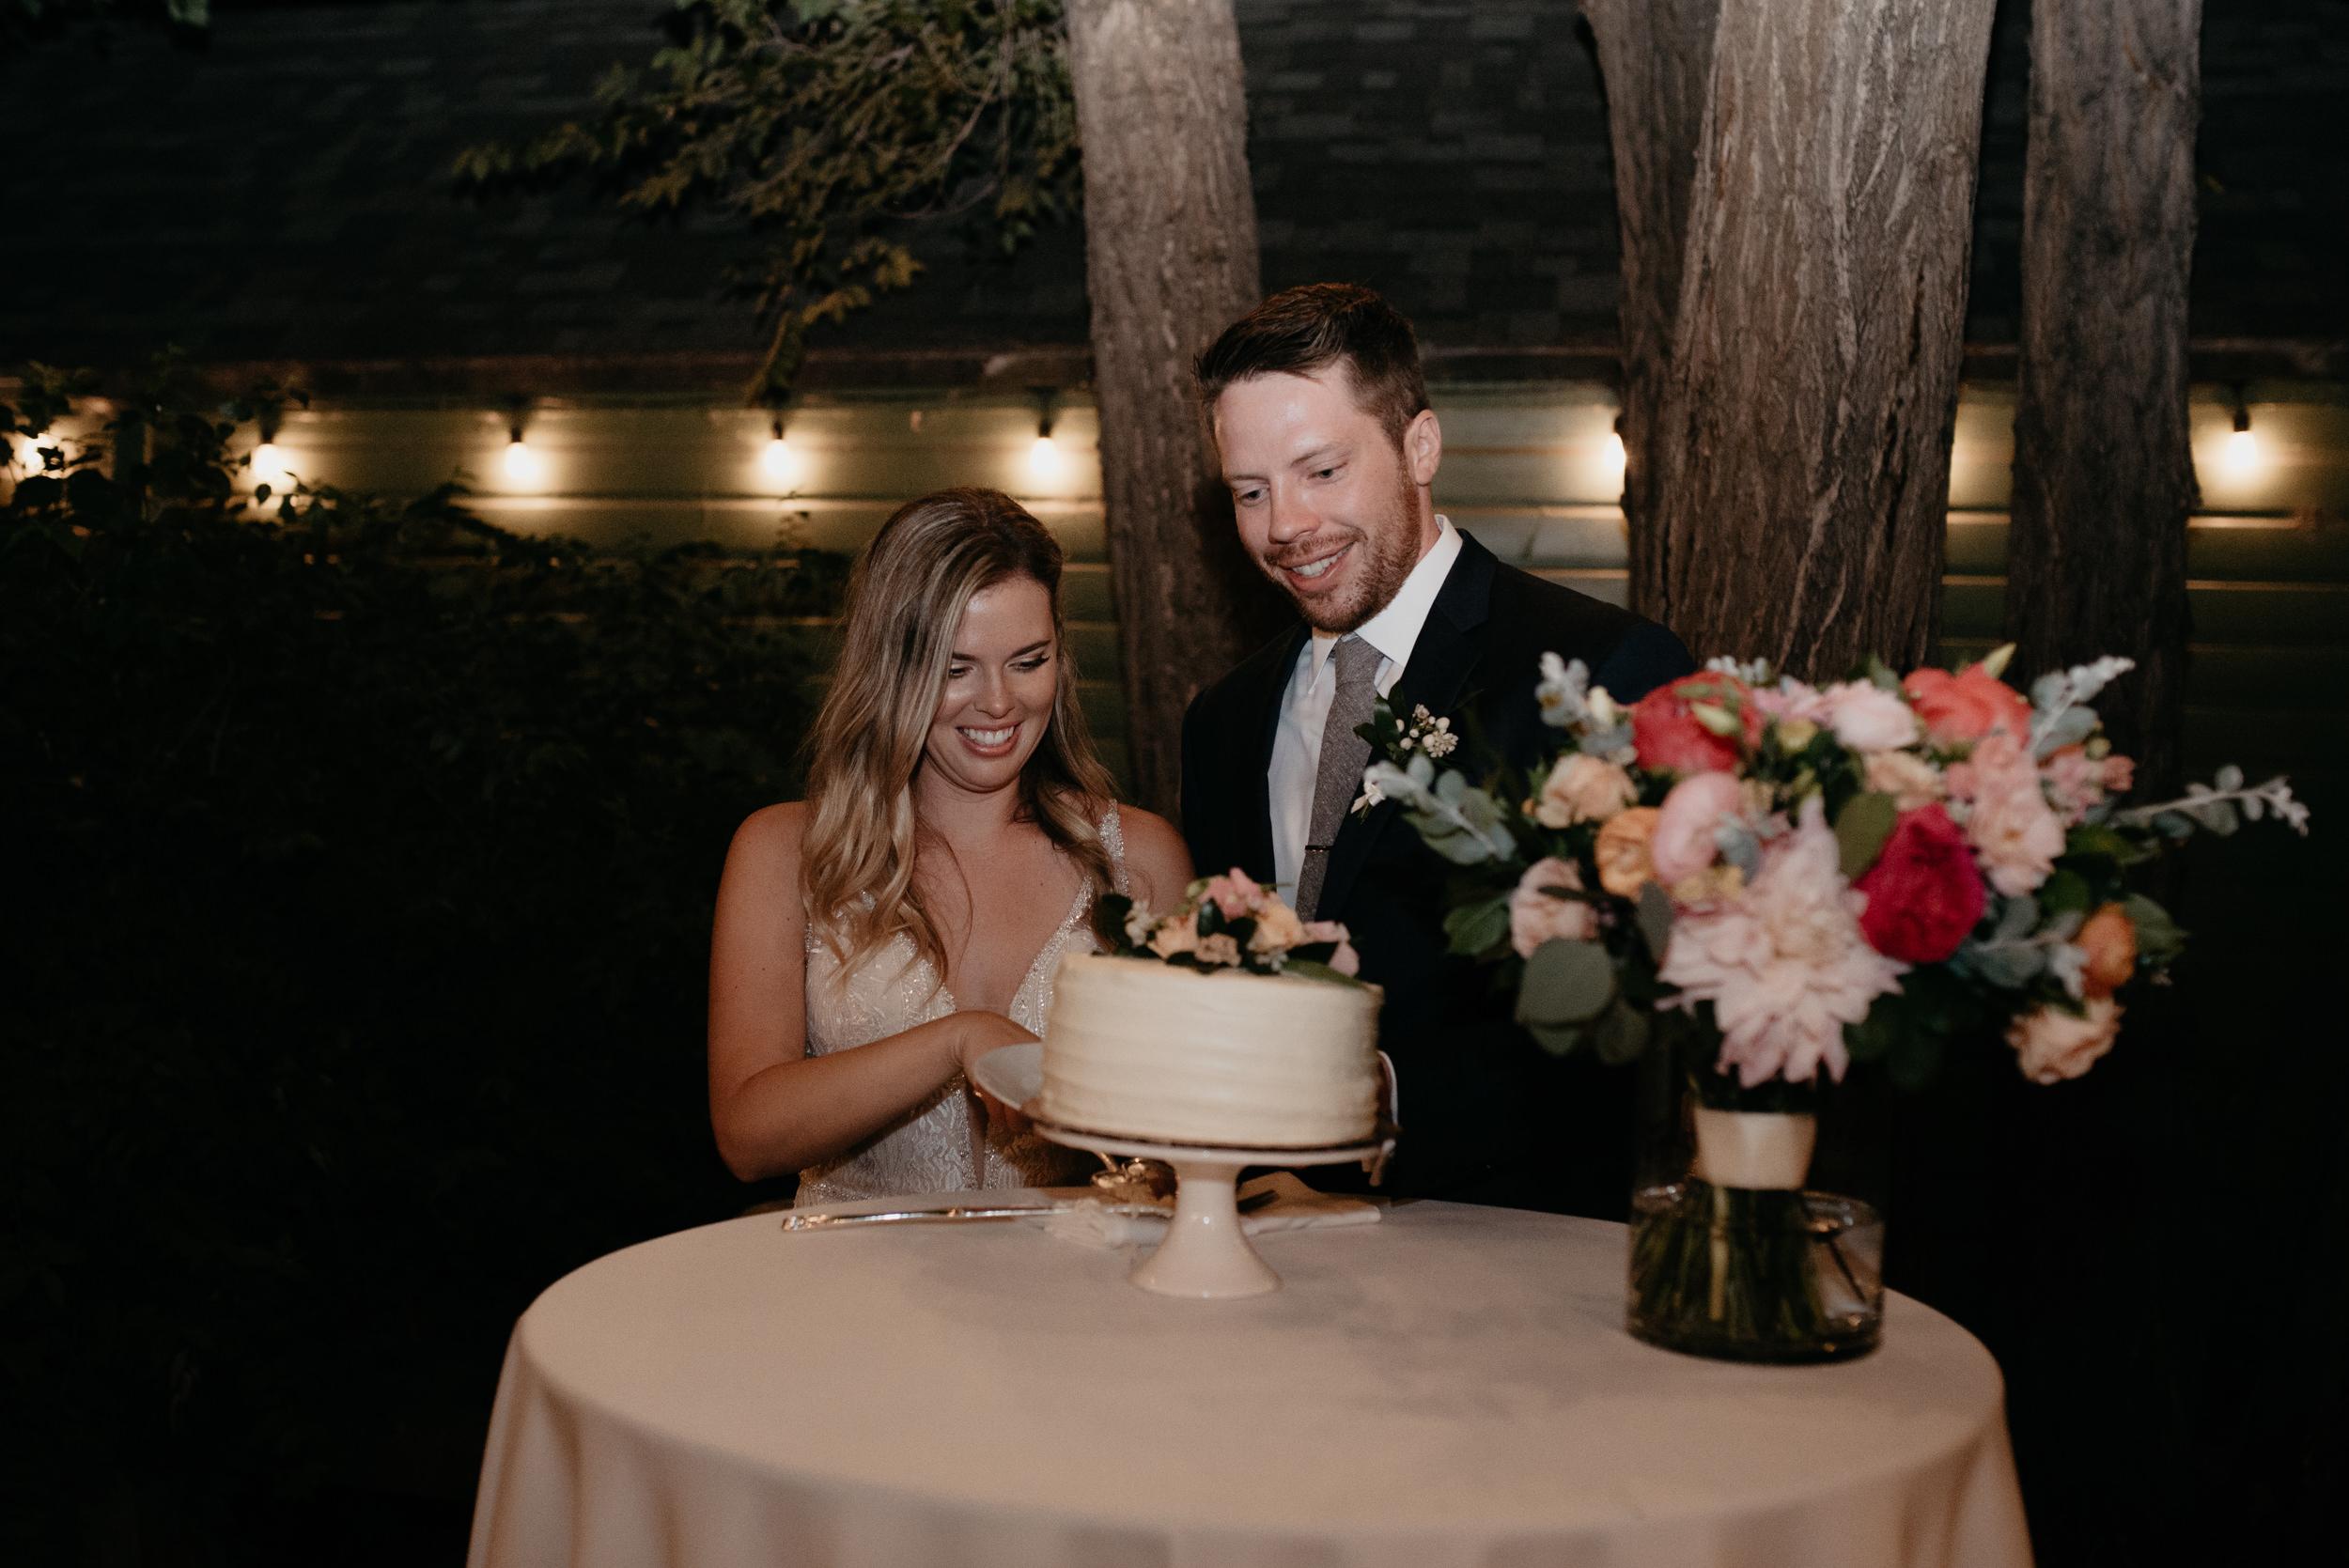 Boulder wedding photos. Bride and groom cutting cake. Denver wedding and elopement photographer.